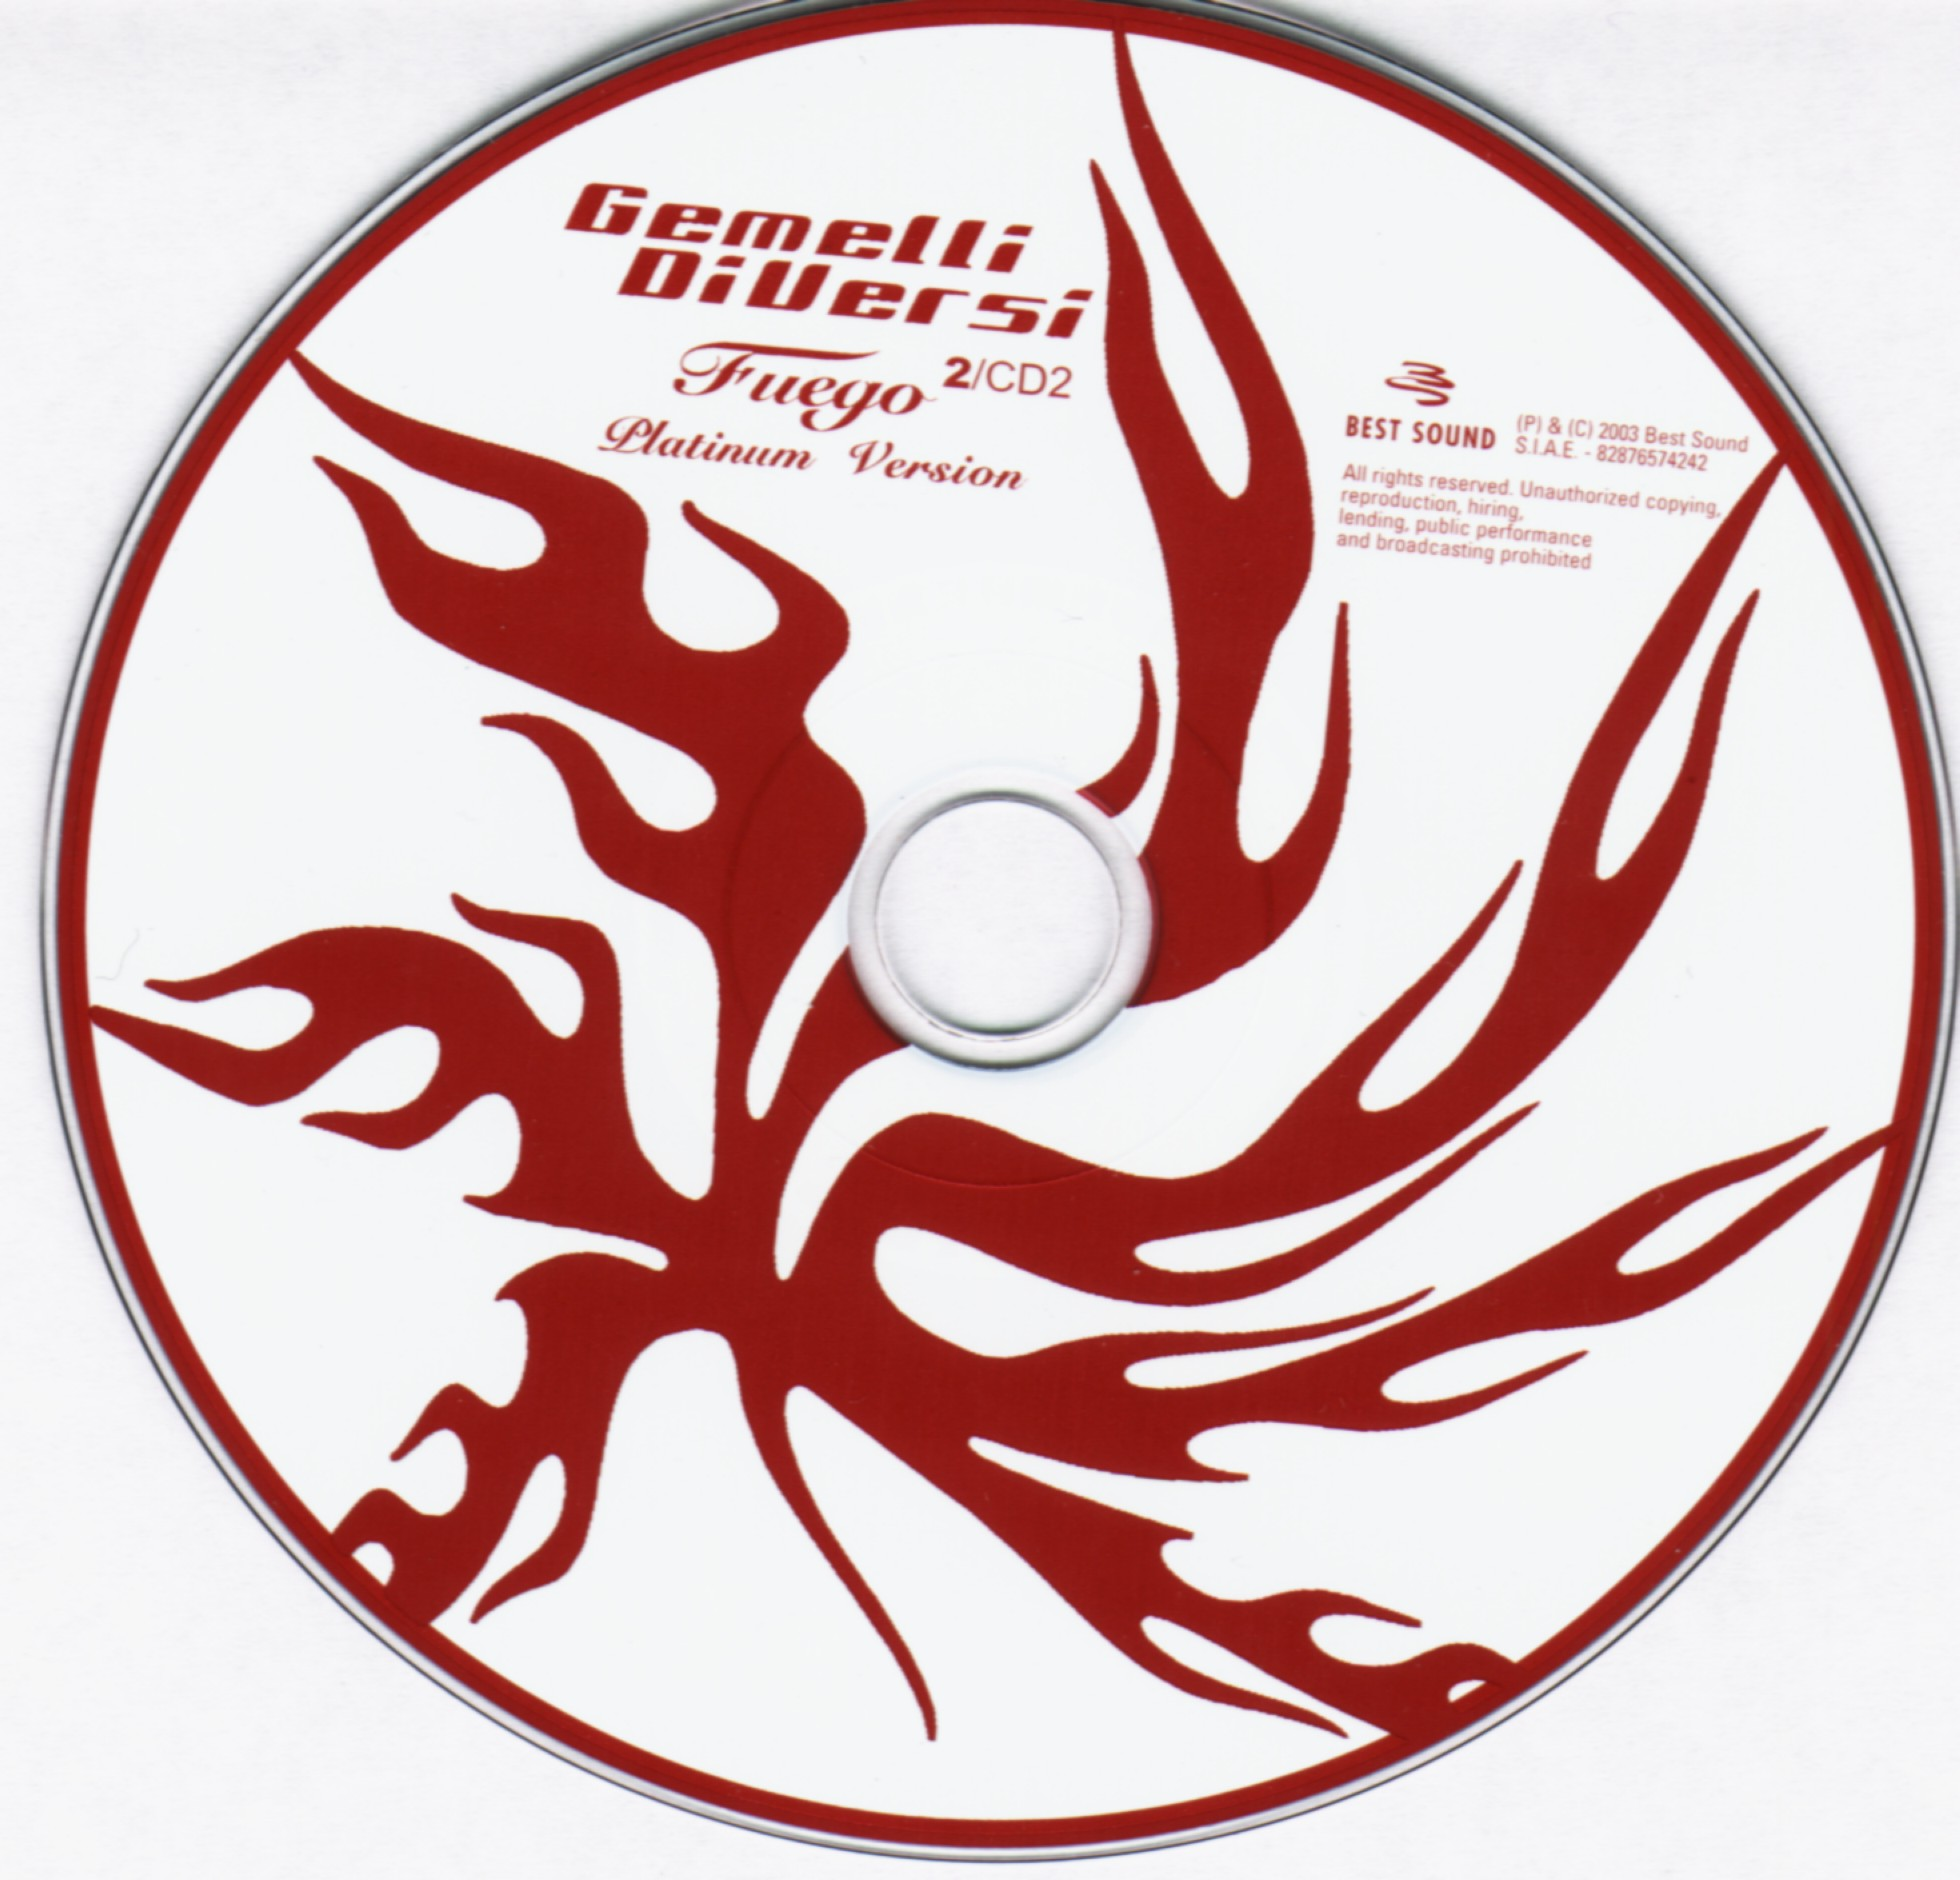 Copertina cd gemelli diversi fuego 2 cd 1 2 cover cd gemelli diversi fuego 2 cd 1 2 - 2 gemelli diversi ...